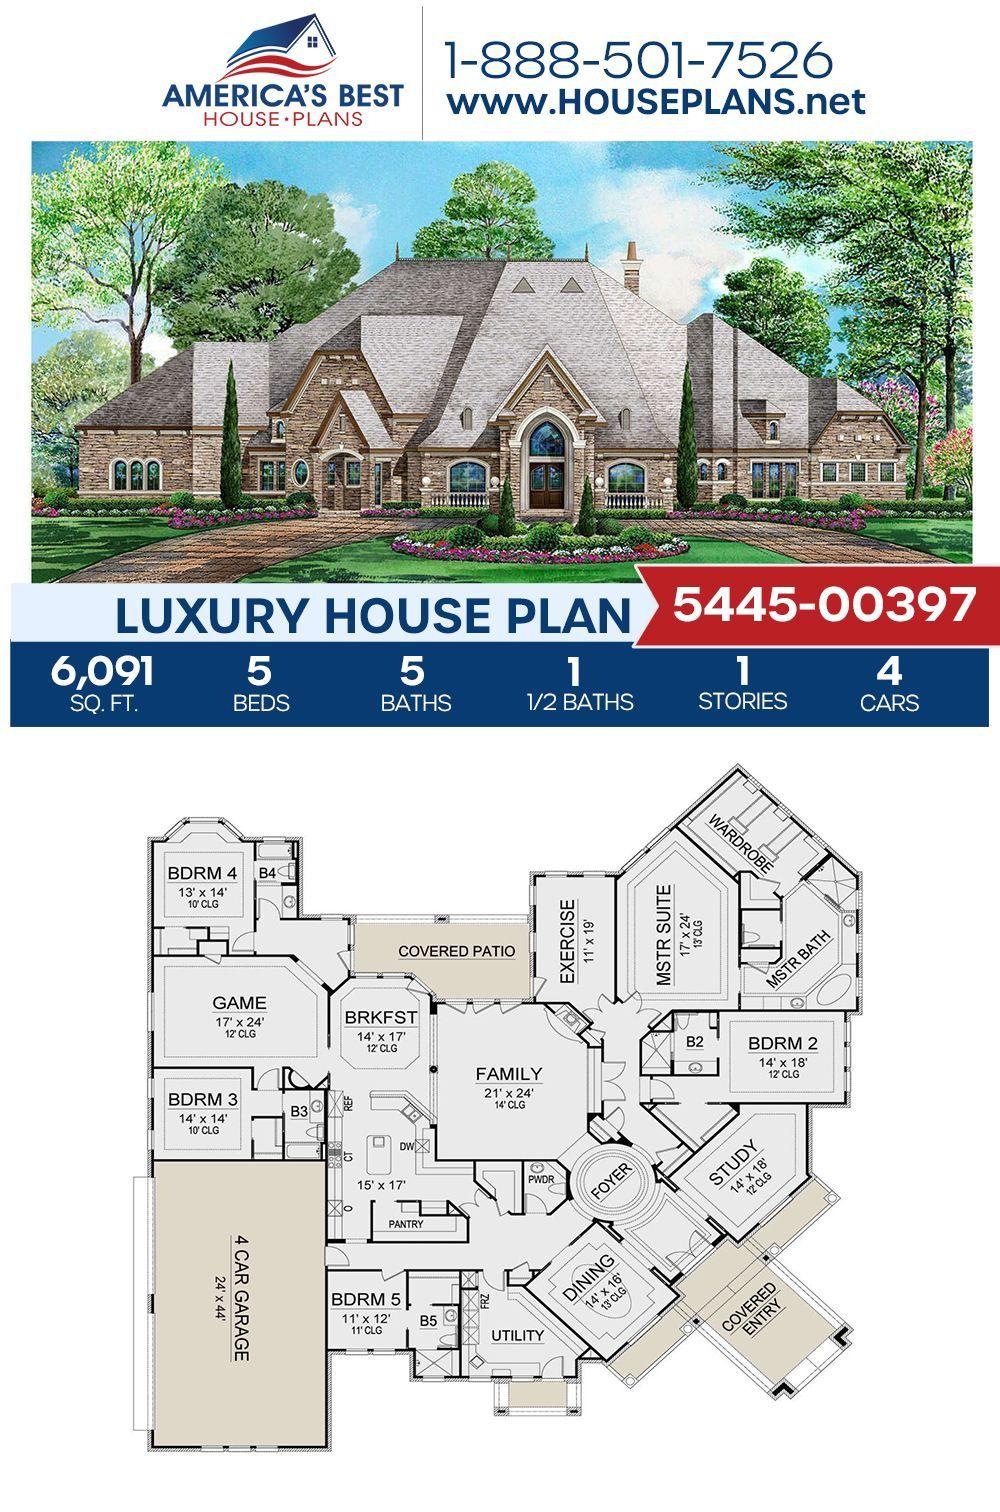 Media Media Media Room Ideas Small Multigenerational House Plans Luxury House Plans Sims 4 House Design